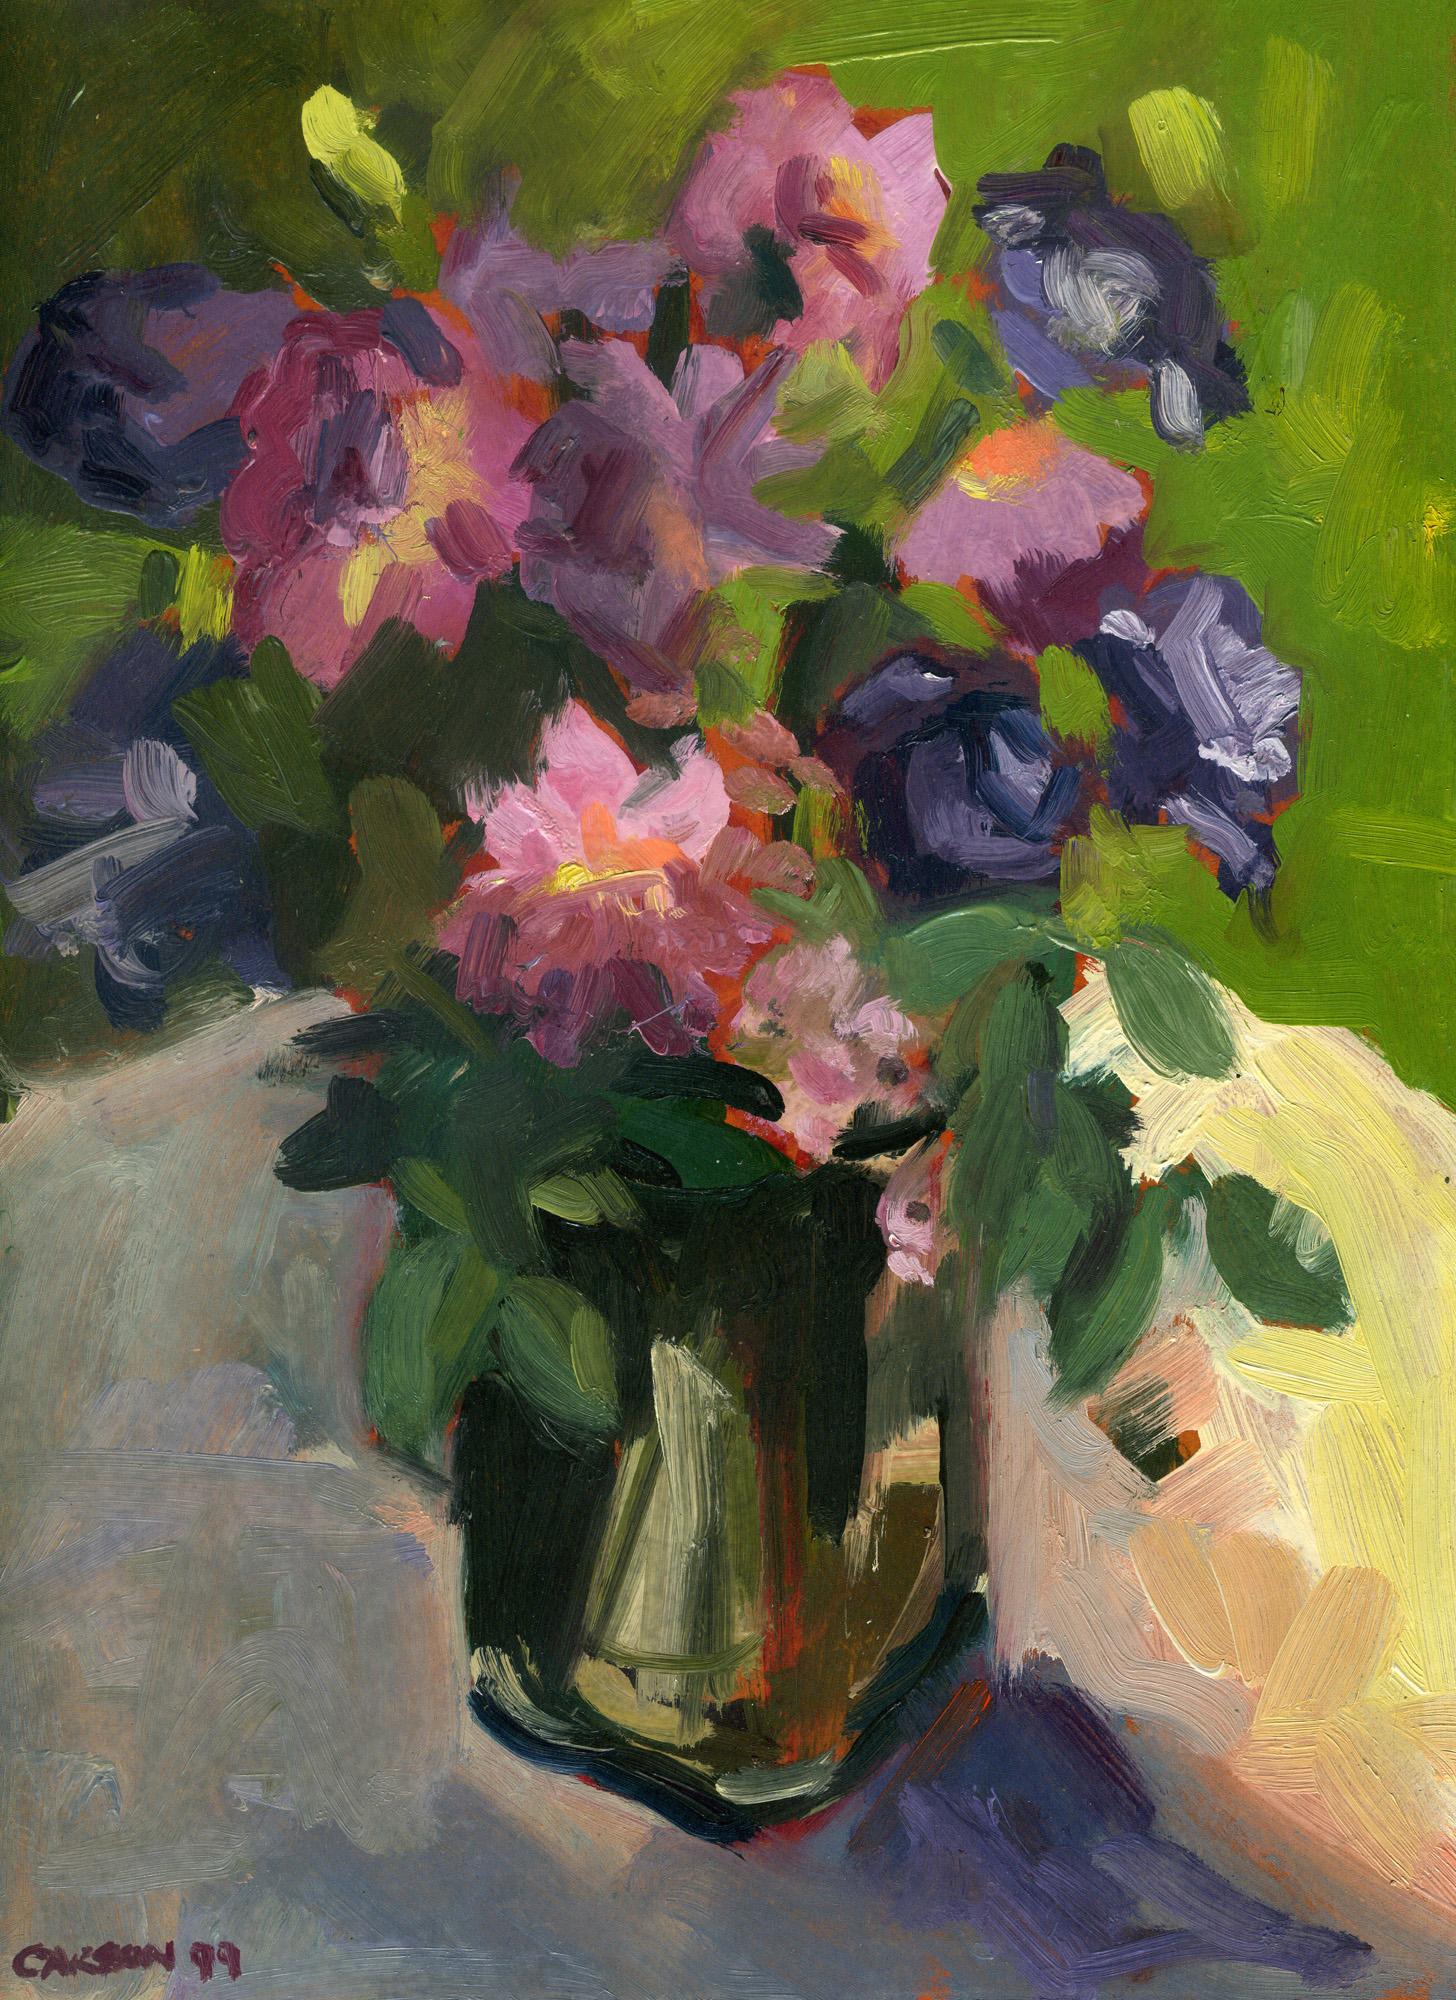 becky's flowers